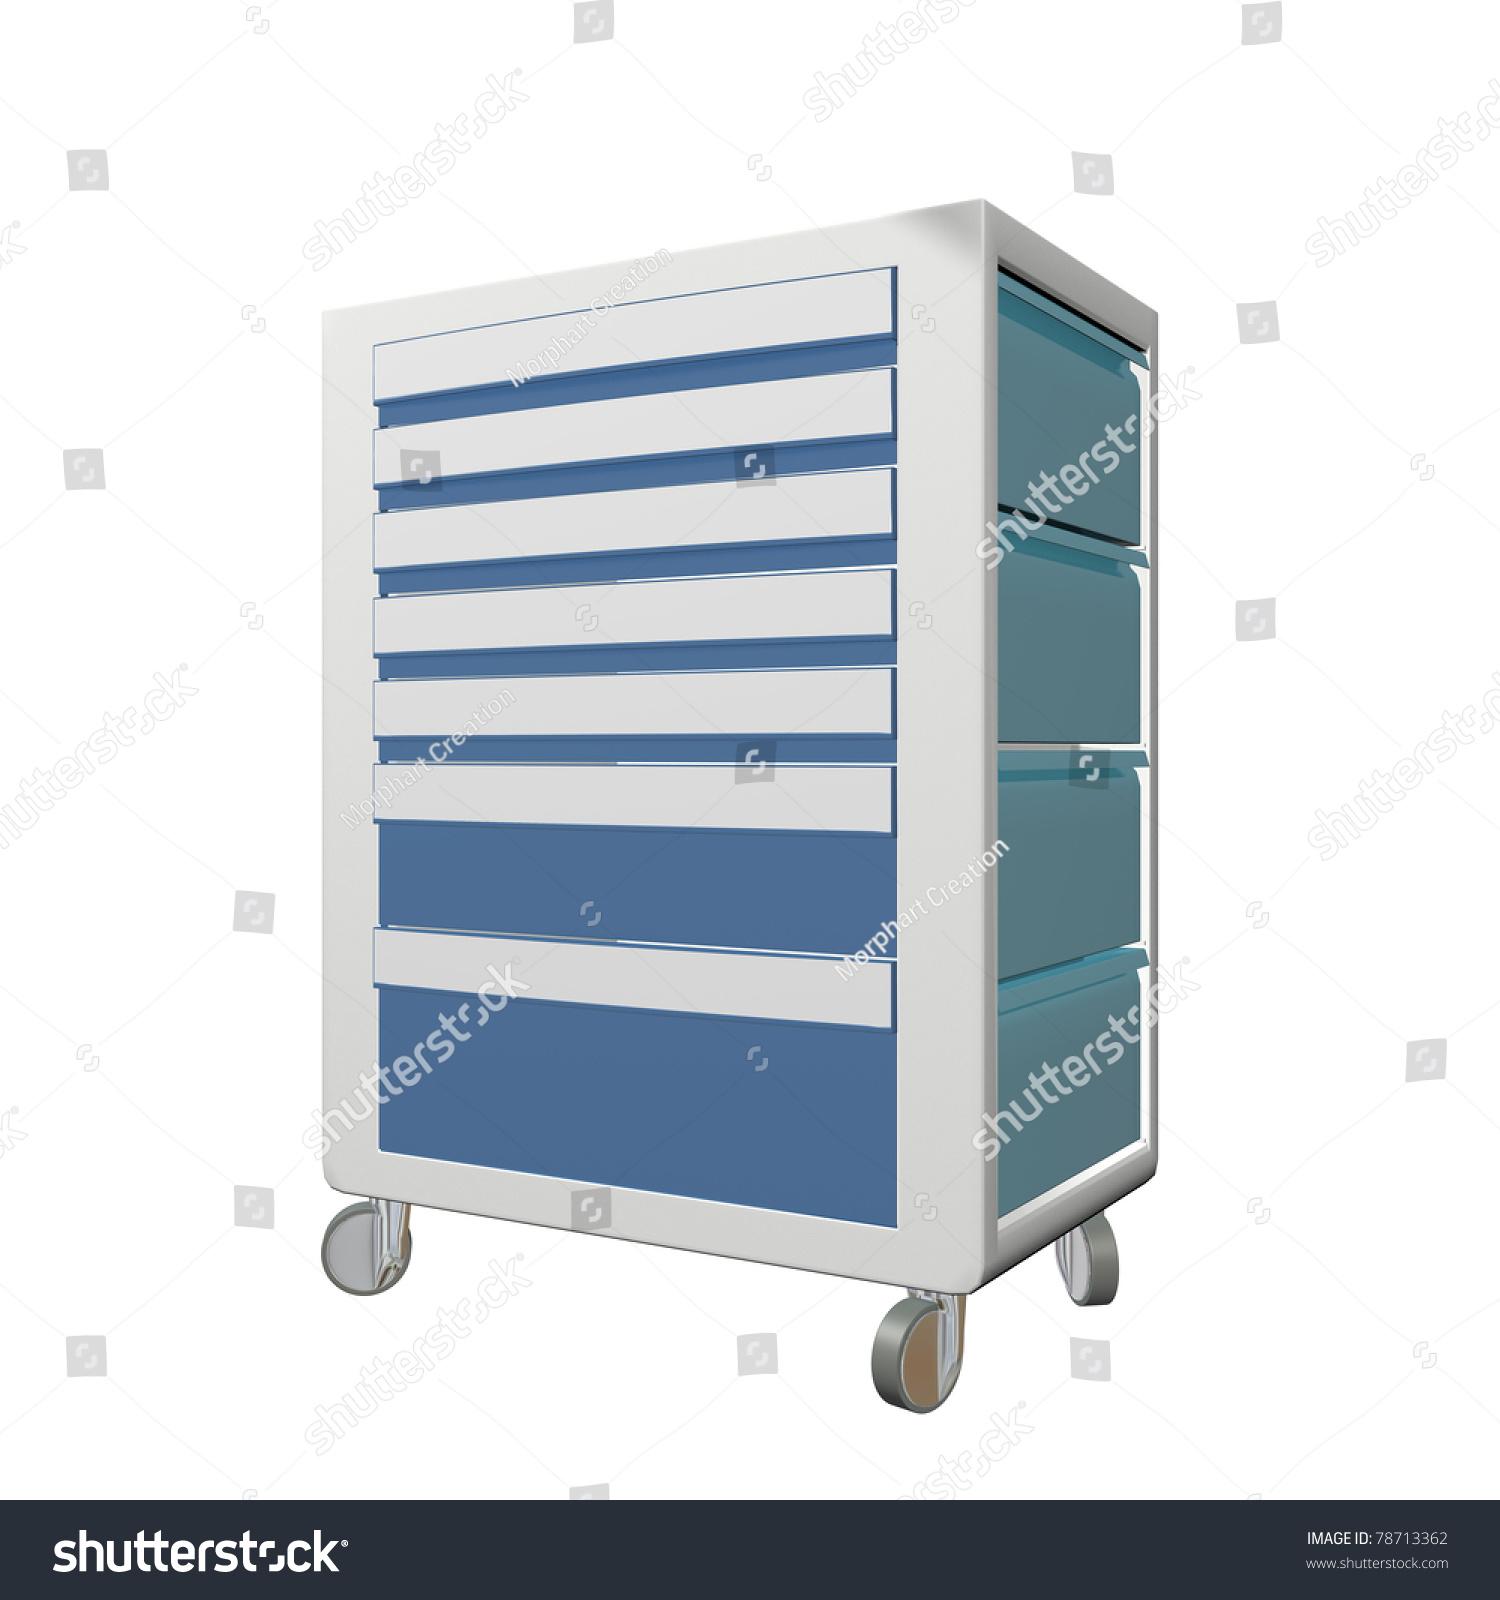 Blue Grey Metal Medical Supply Cabinet Stock Illustration 78713362 ...